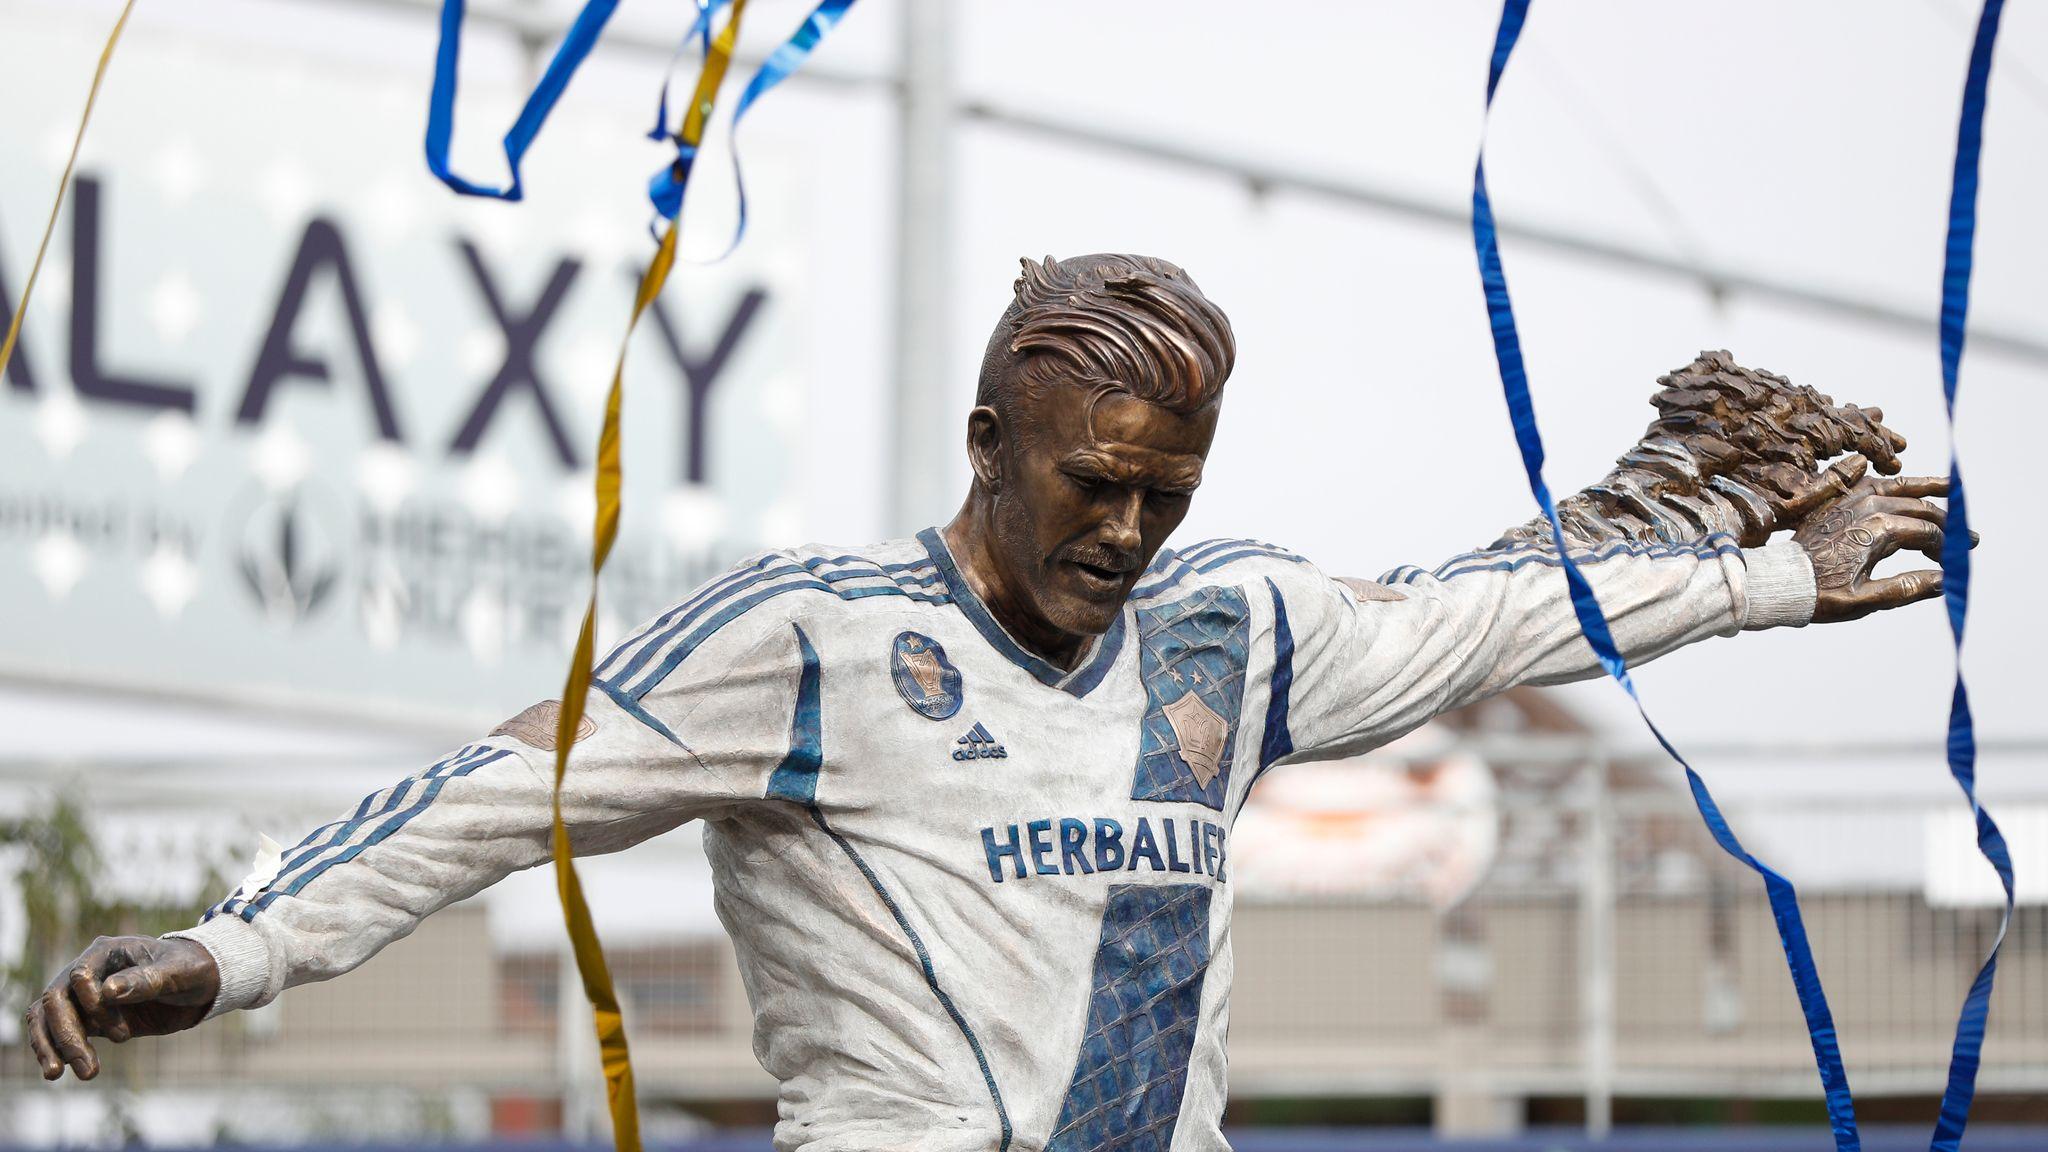 be4a8c1ce WATCH: David Beckham statue unveiled at LA Galaxy   Football News   Sky  Sports